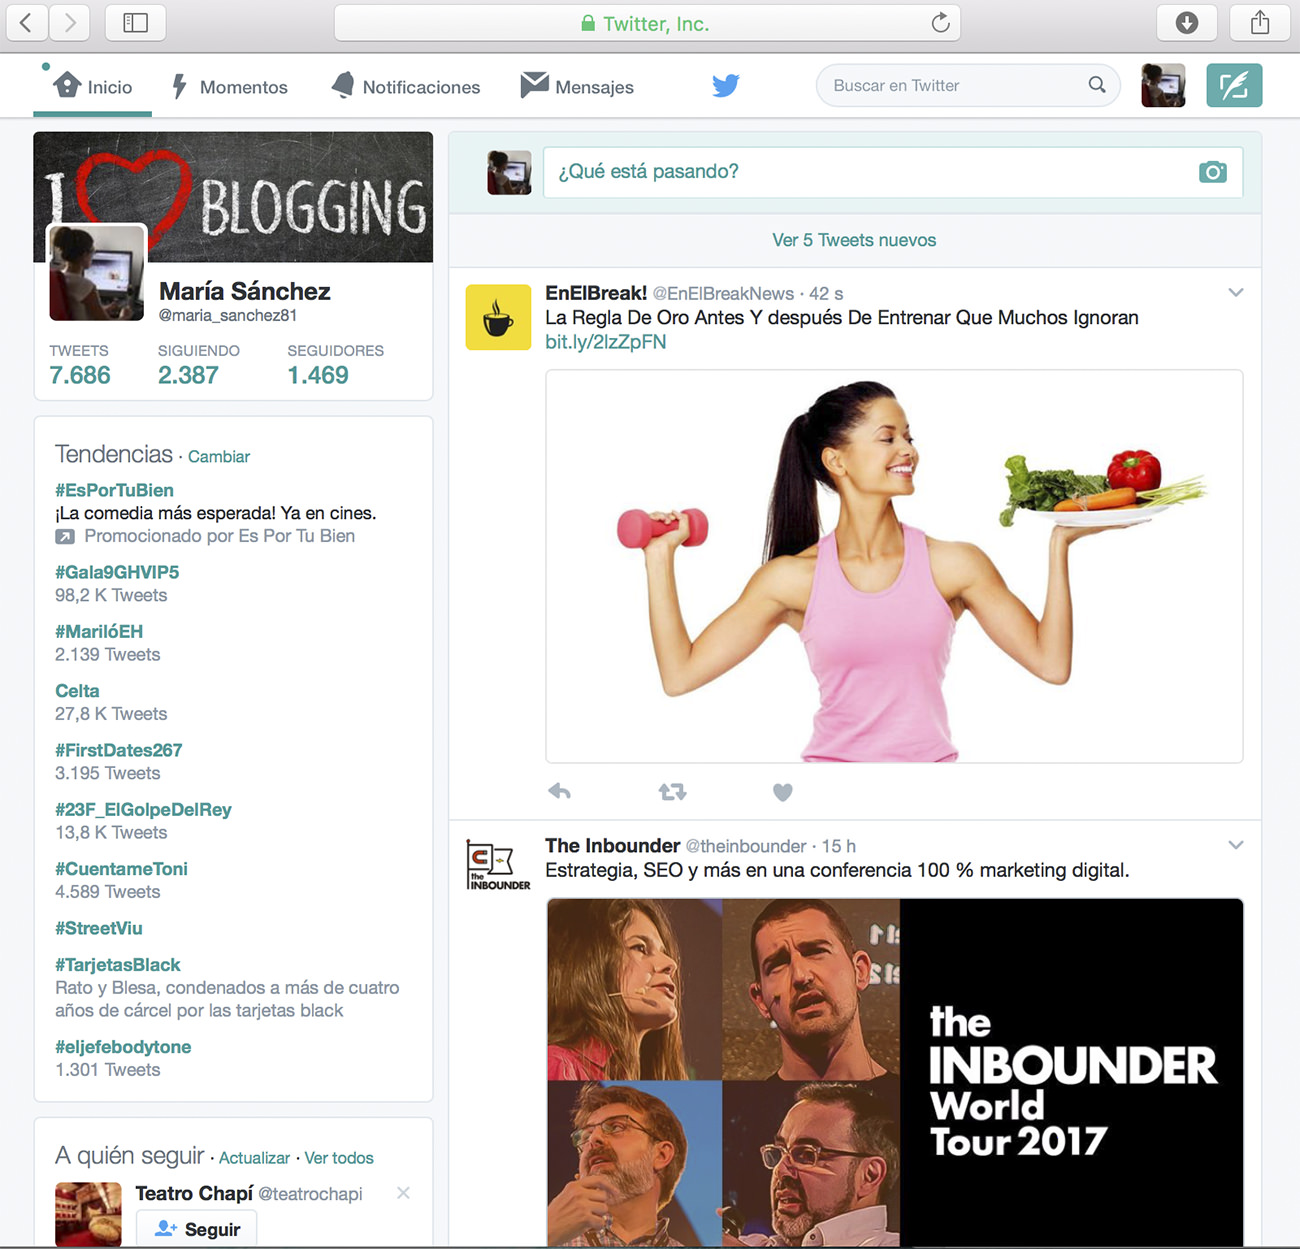 Ejemplo de timeline de Twitter para empresas.